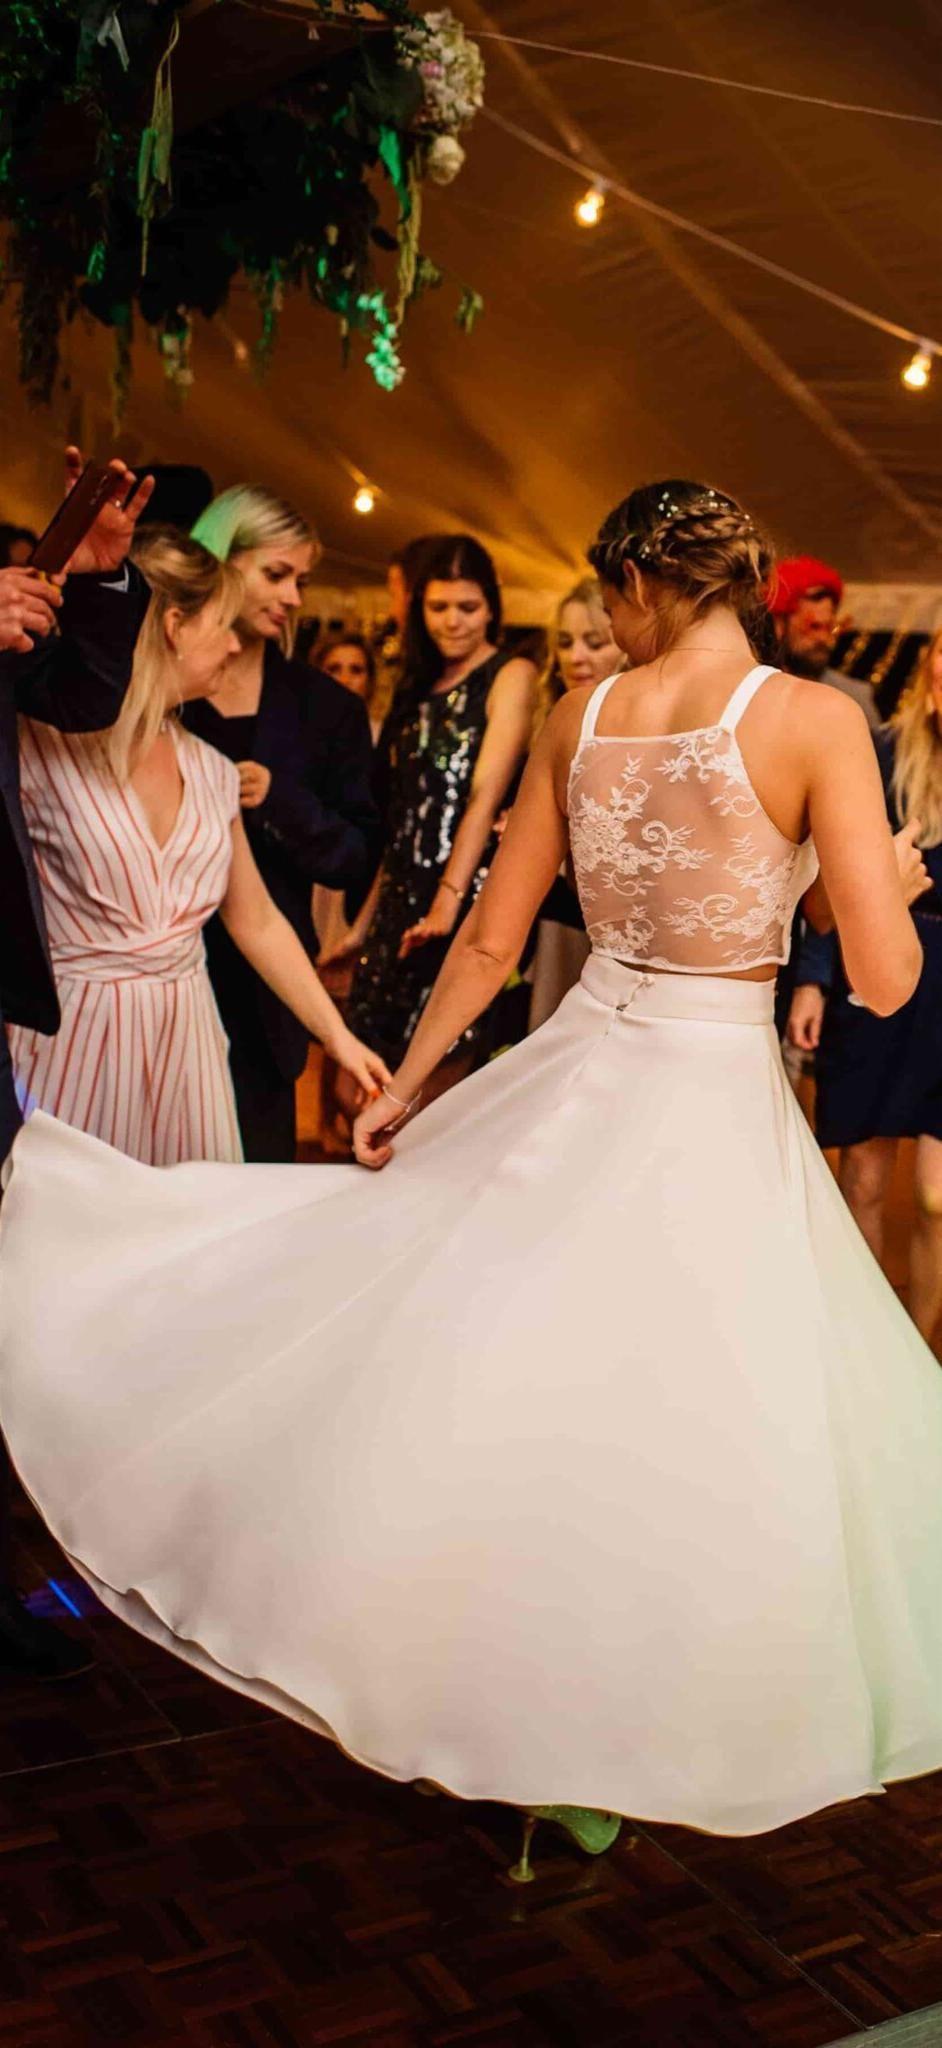 Bride of Ollichon Alex Wedding reception outfit